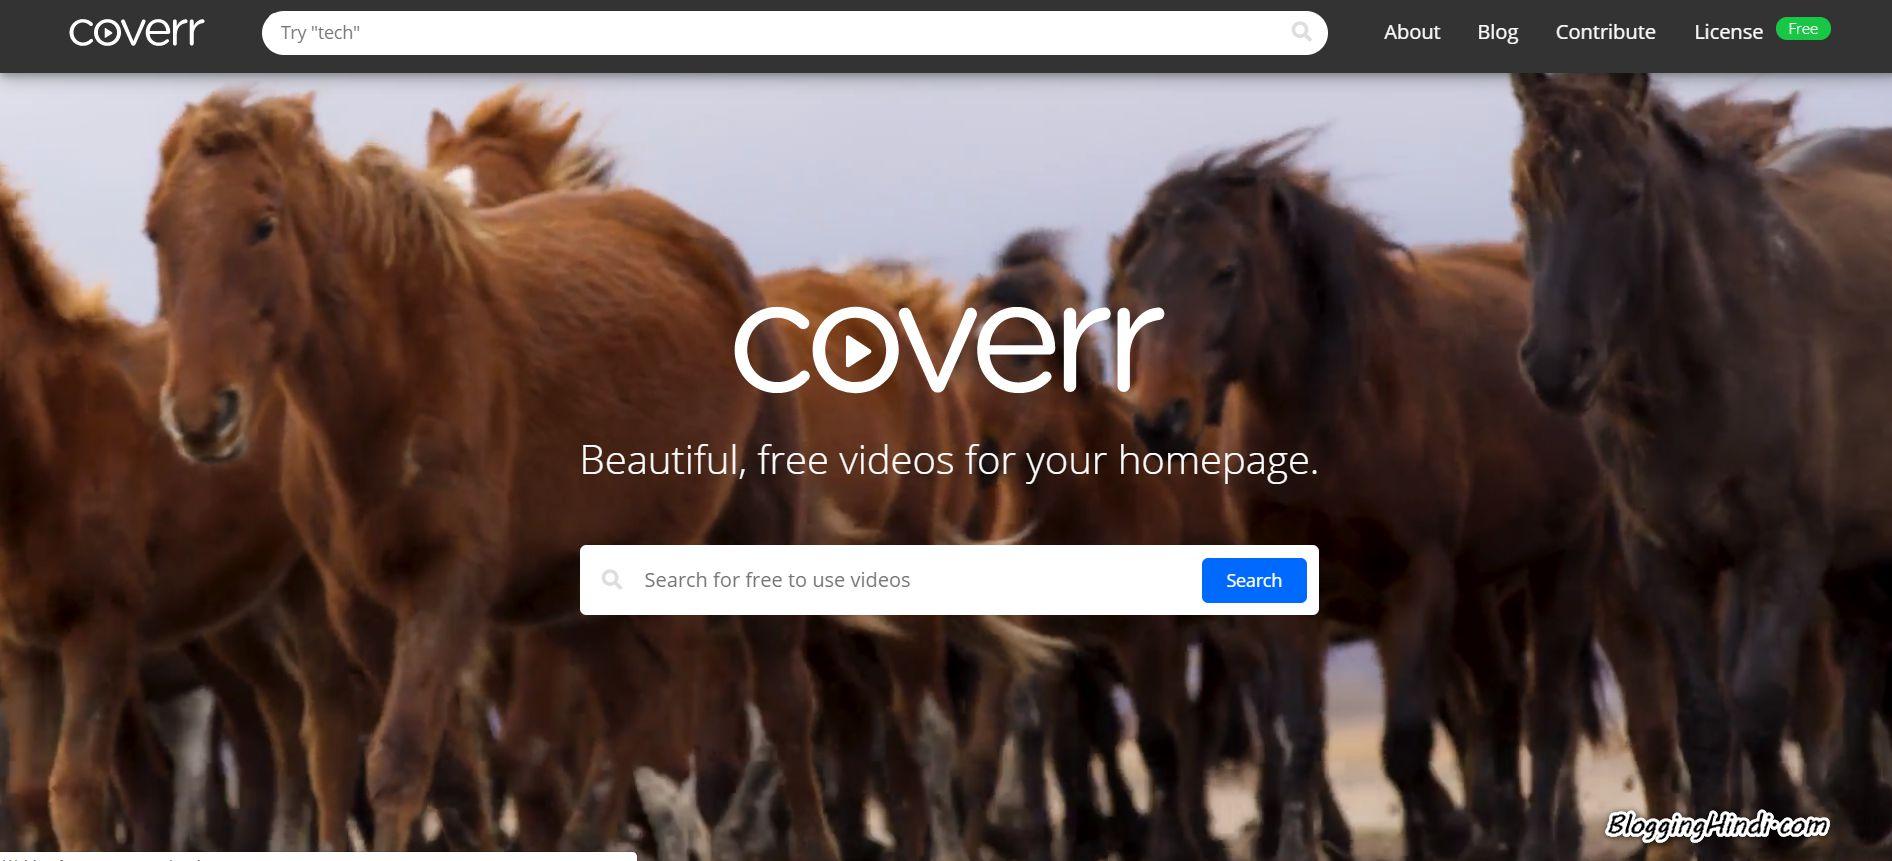 YouTube Ke Liye Creative Common Video Download Kaha Se Kare? Top 5 Websites 2